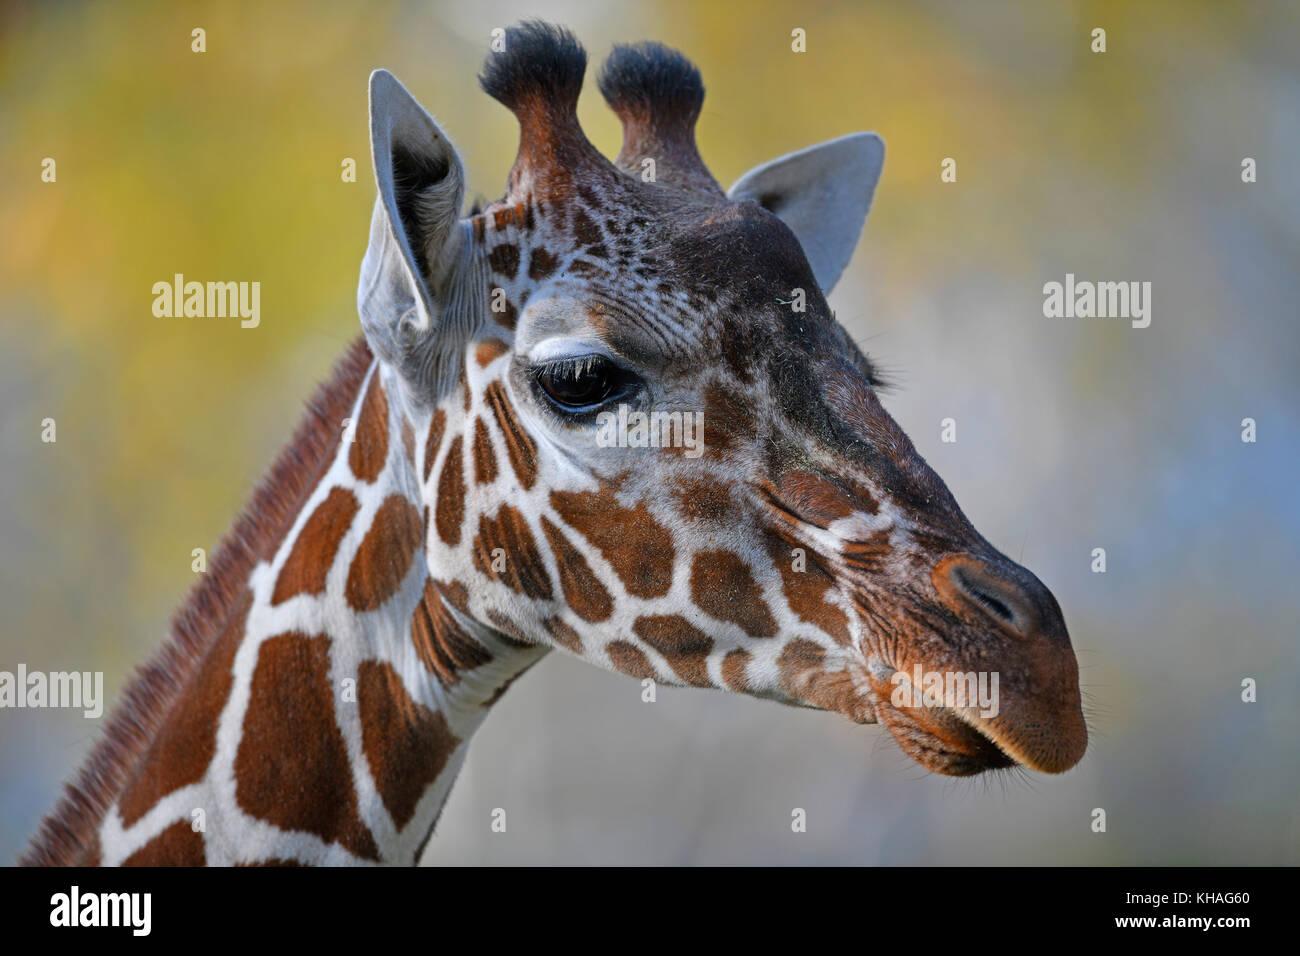 Somali Girafe (Giraffa camelopardalis reticulata), portrait, captive Photo Stock